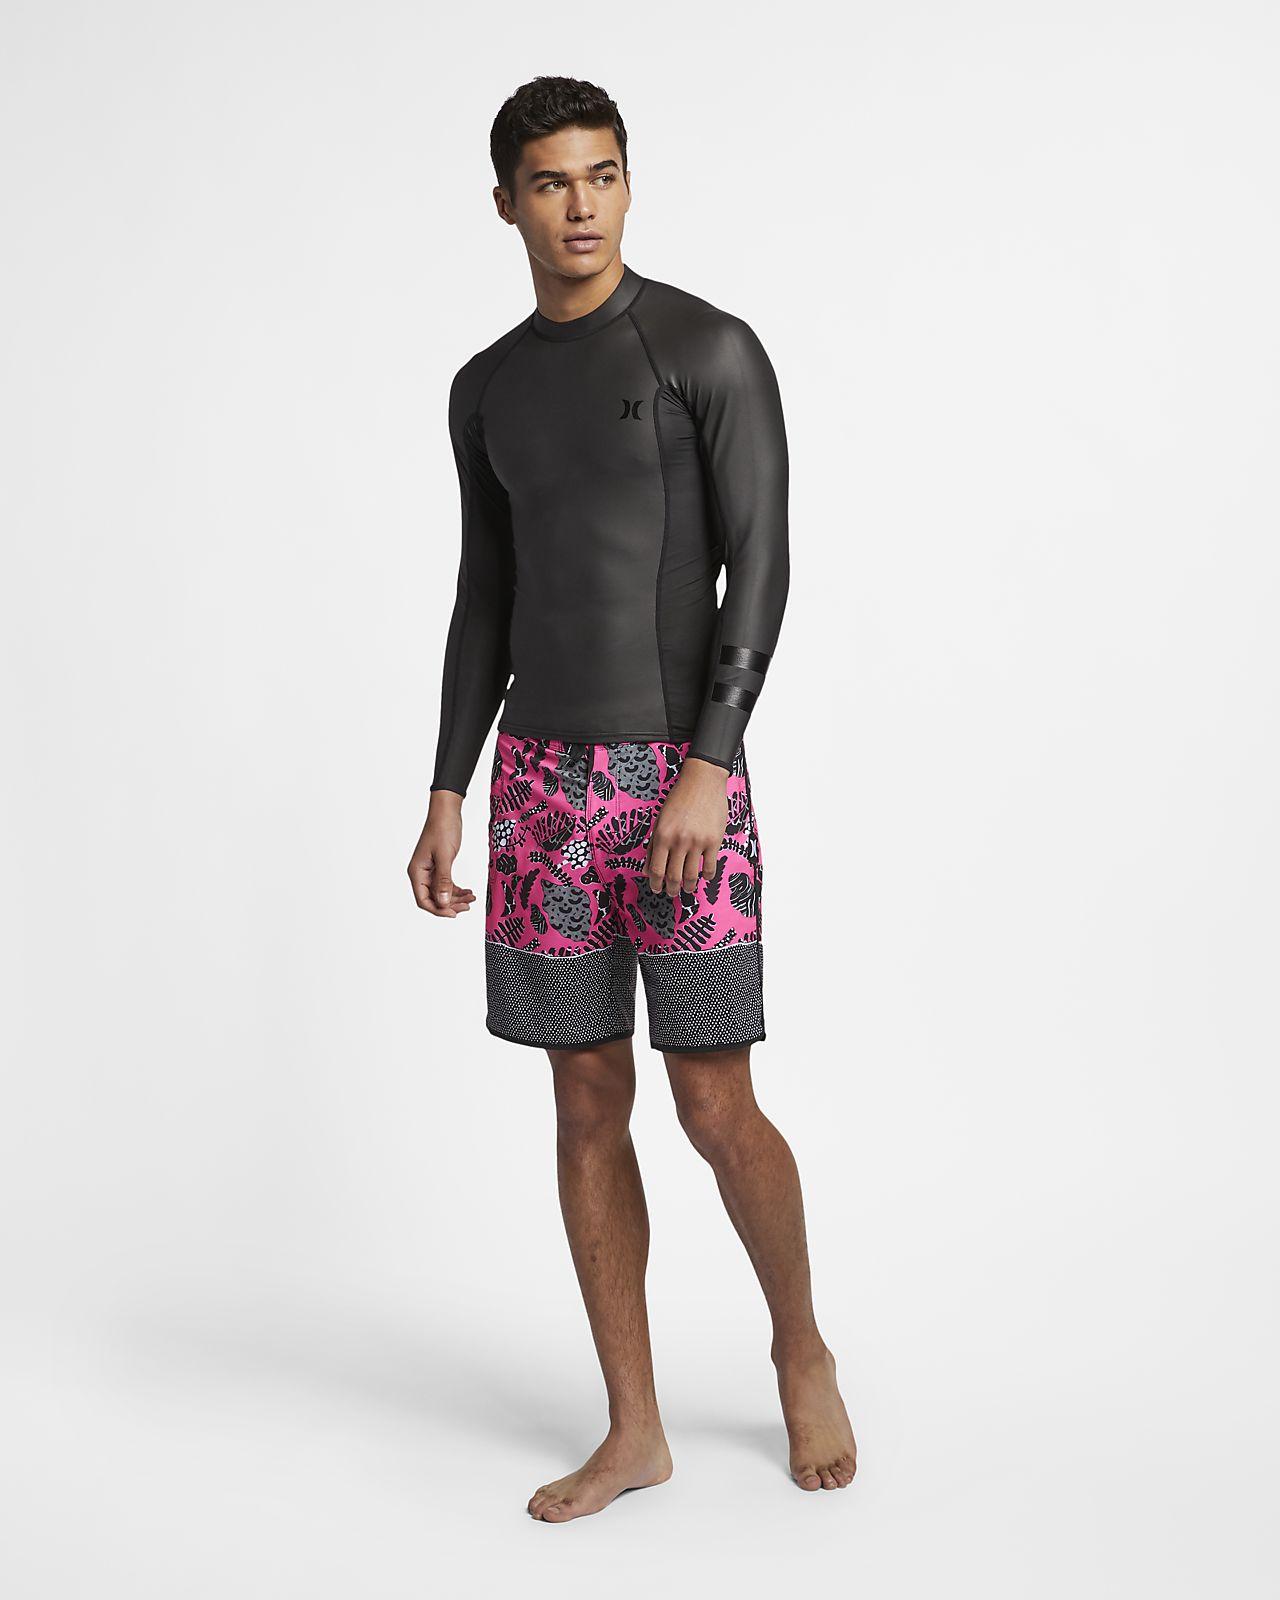 02a274da0c86 Ανδρική μακρυμάνικη μπλούζα σέρφινγκ Hurley Pro Max. Nike.com GR